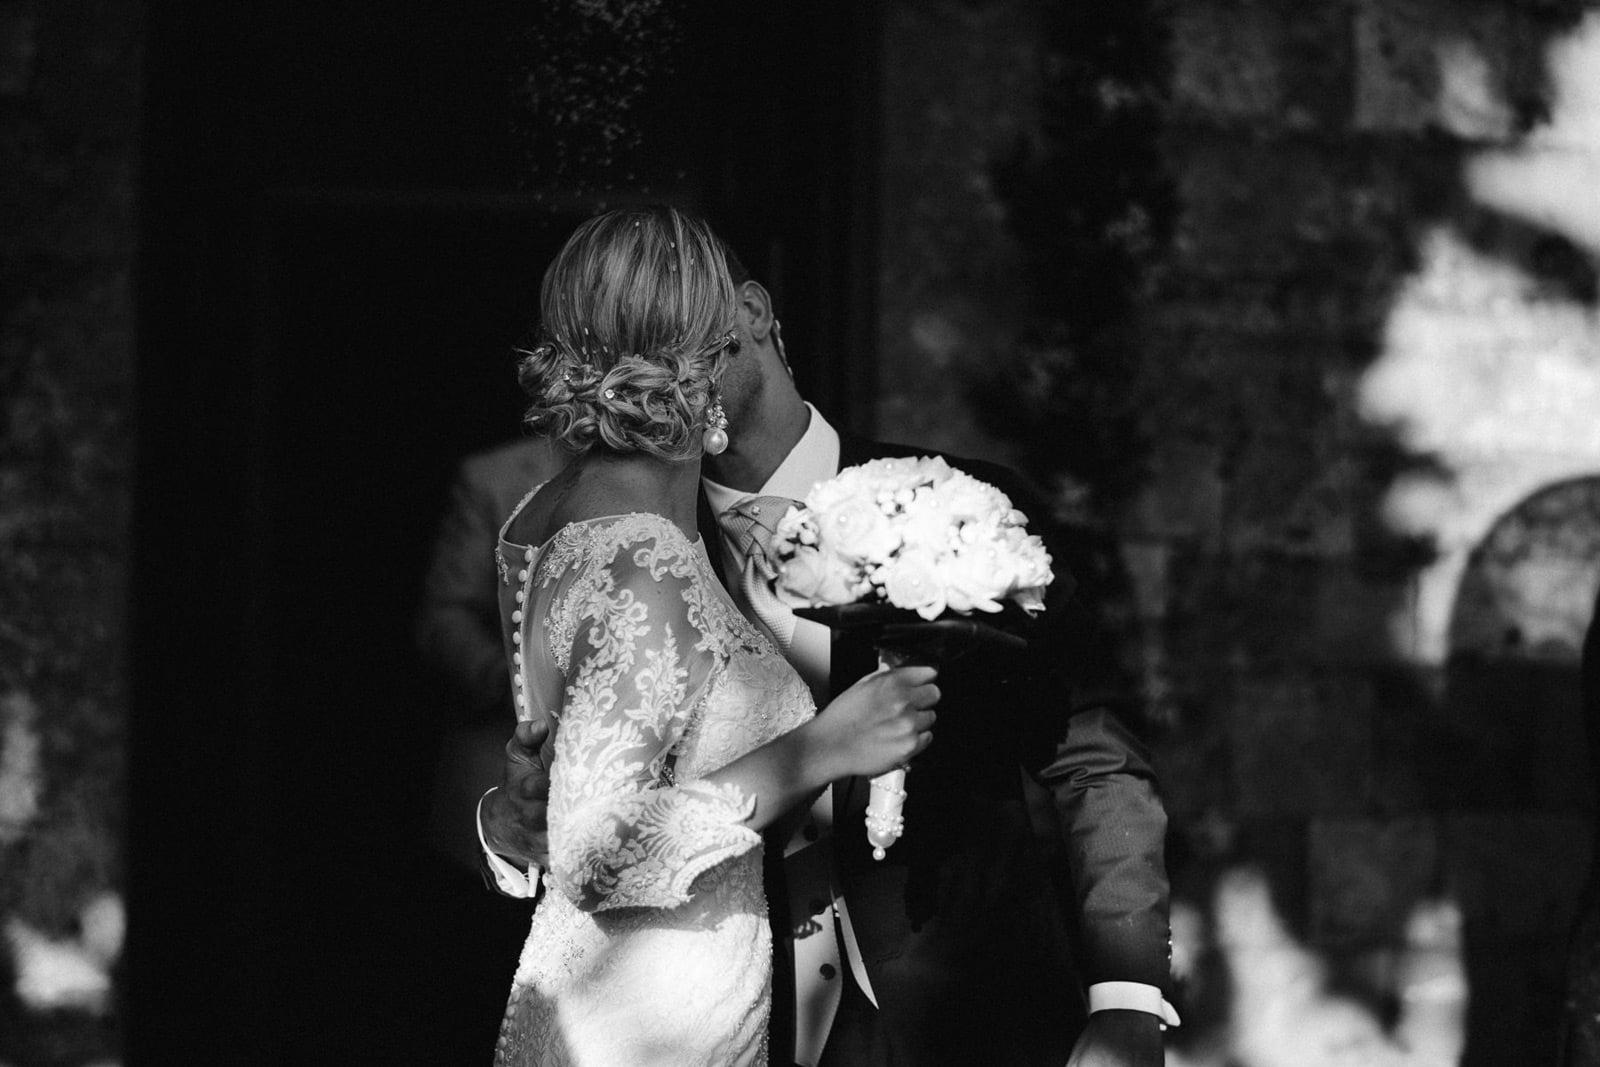 057-wedding-florence-palazzo-borghese